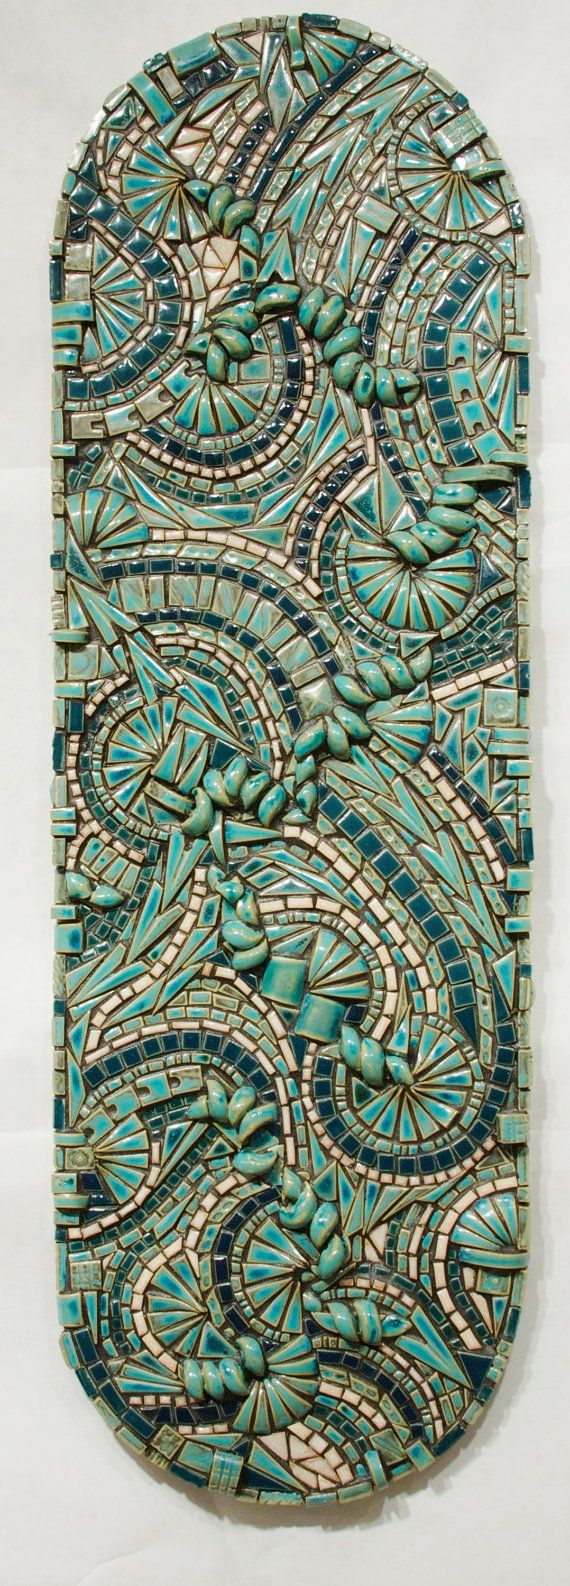 Abstract mosaic original wall art handmade ceramic tile pathways abstract mosaic original wall art handmade ceramic tile pathways dailygadgetfo Gallery